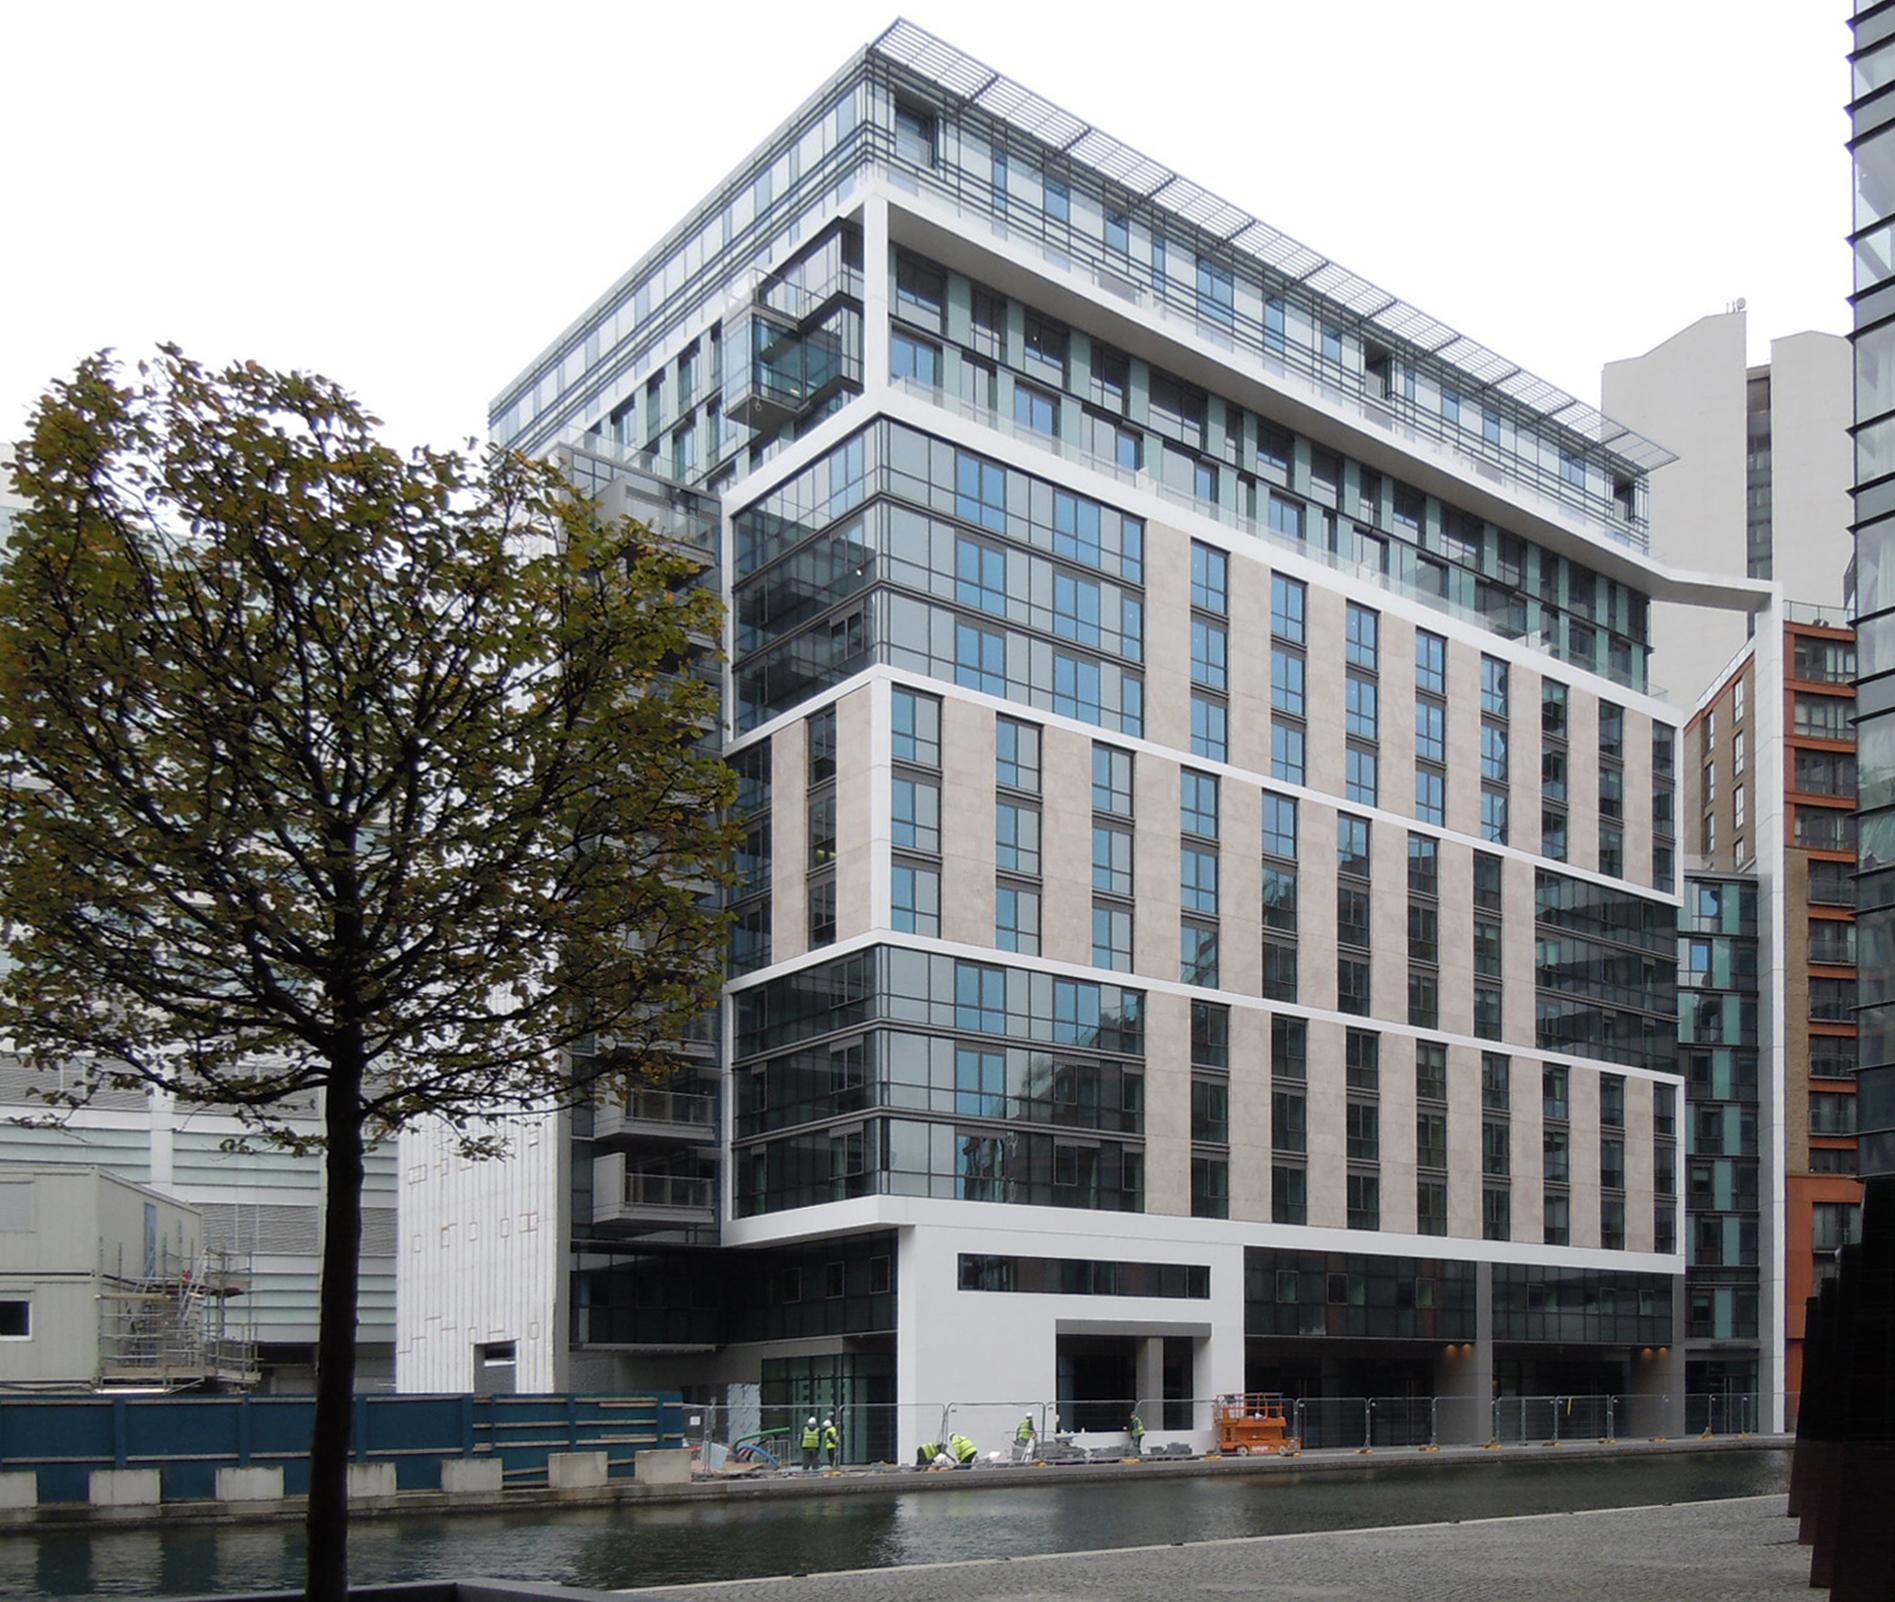 Paddington Basin Building 4